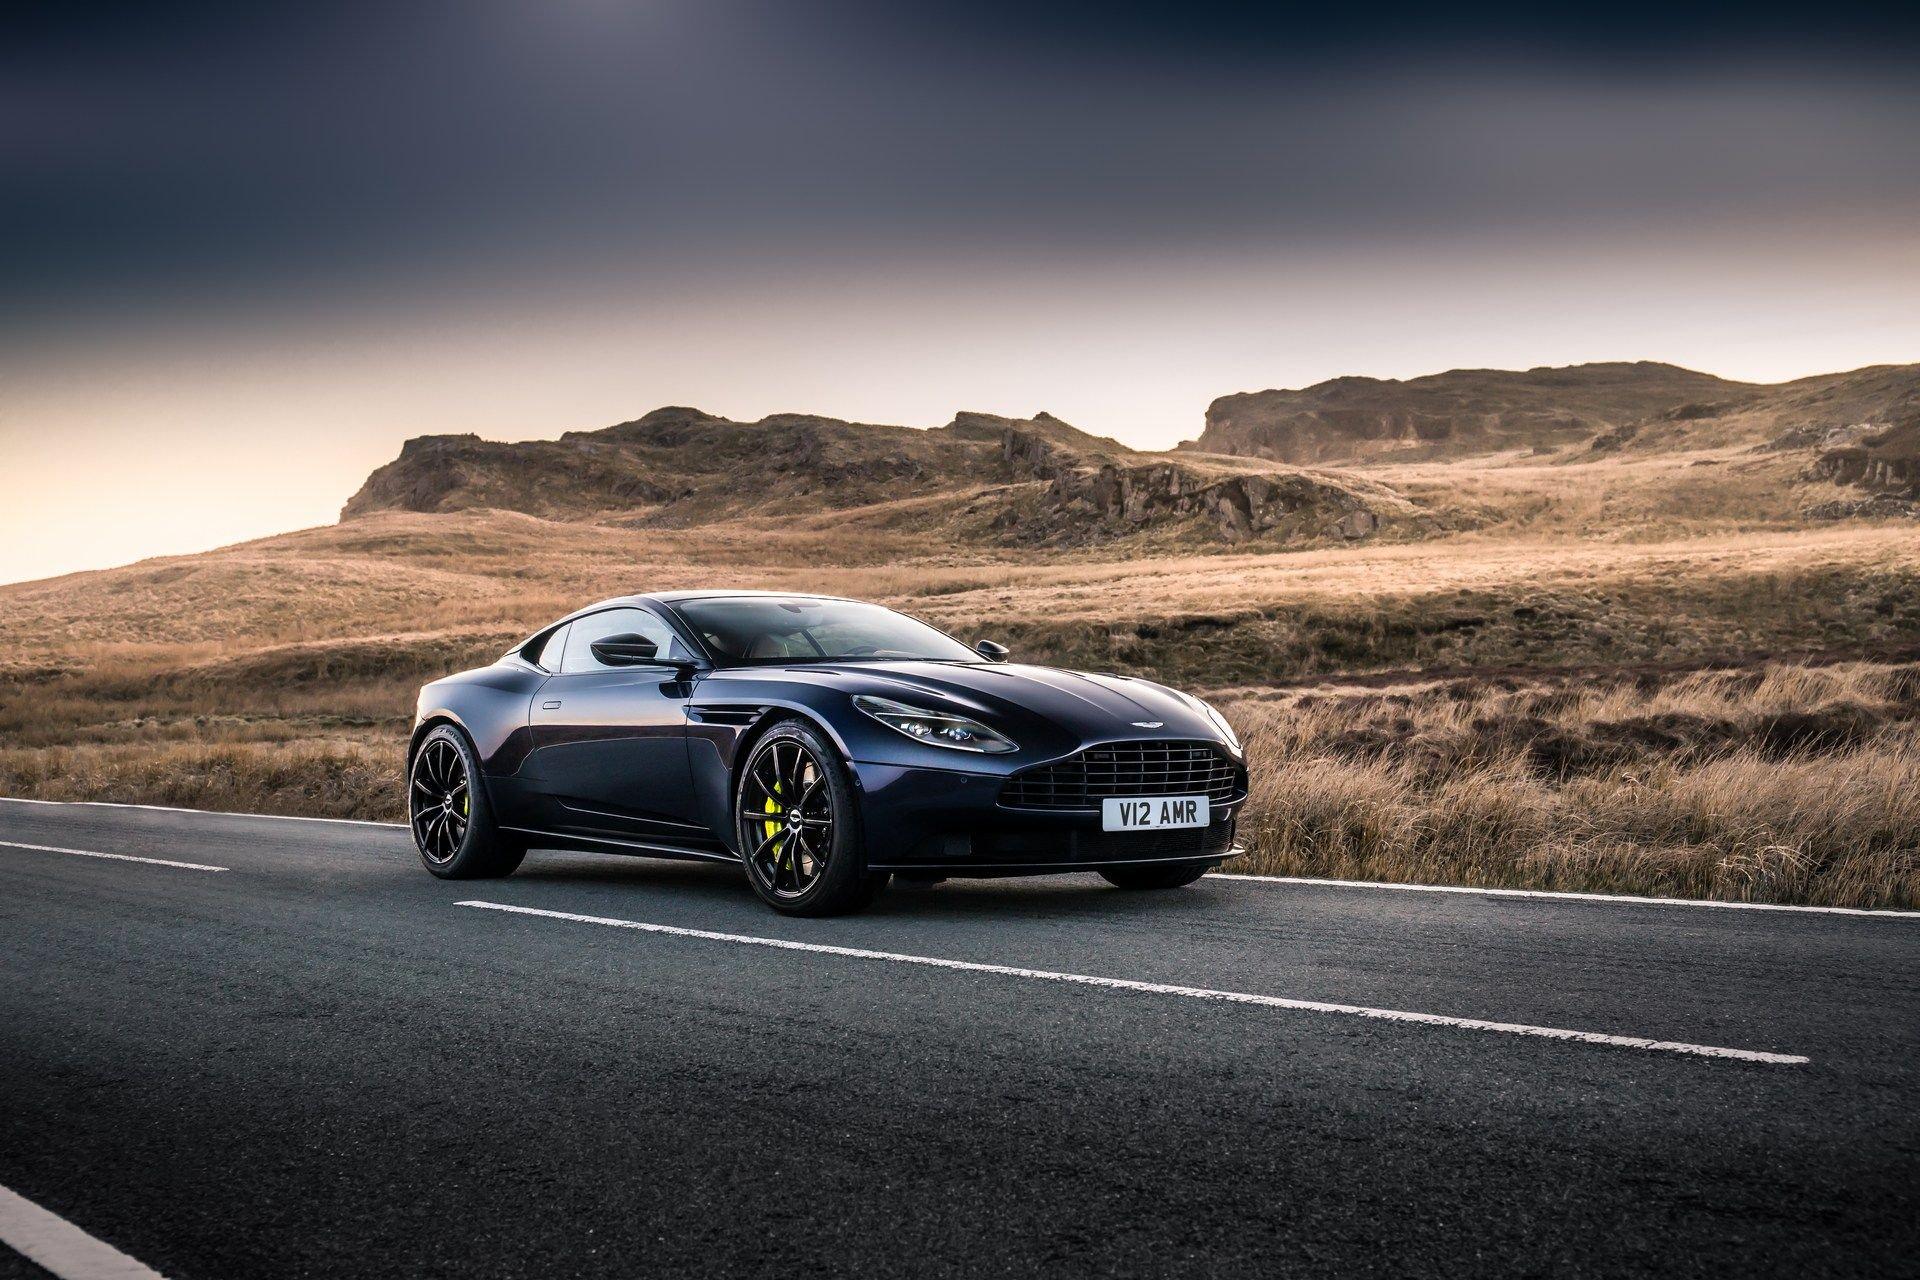 Aston-Martin-DB11-AMR-23